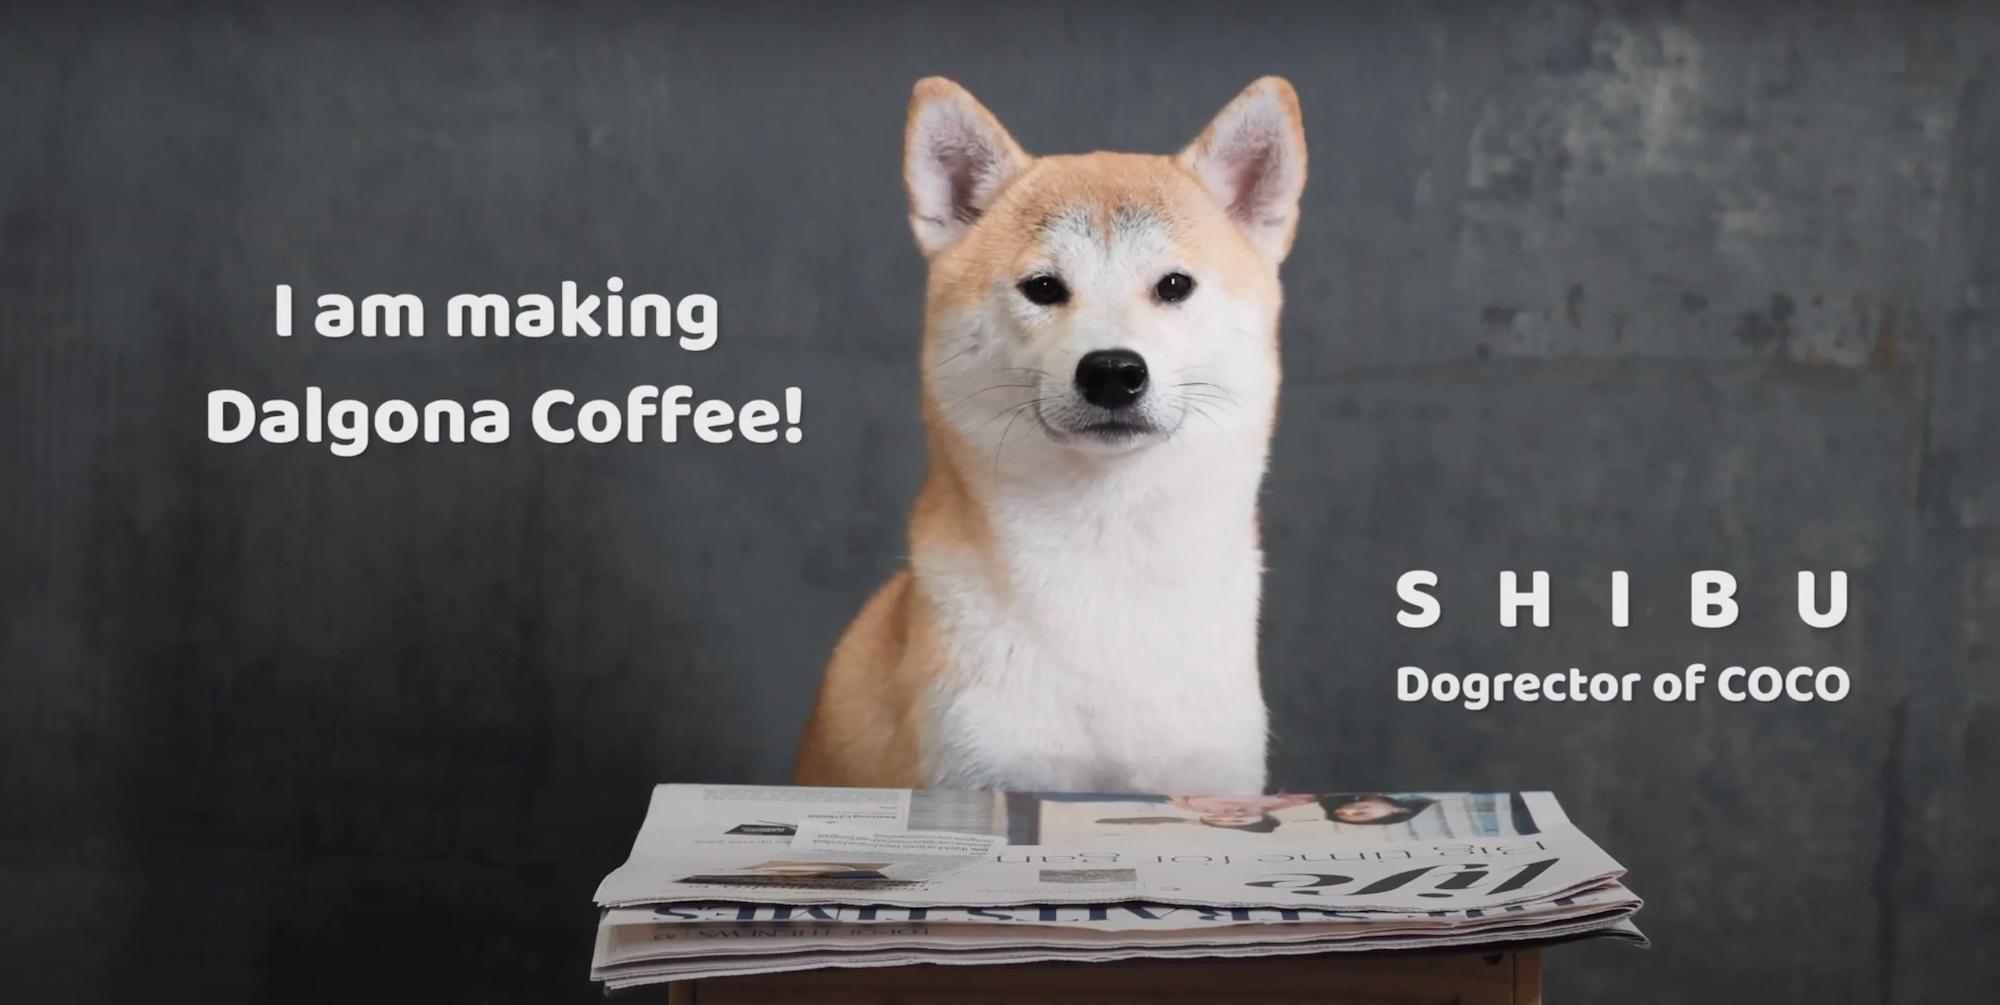 Screenshot DALGONA COFFEE DRINK DOG video production company in singapore coco creative studio